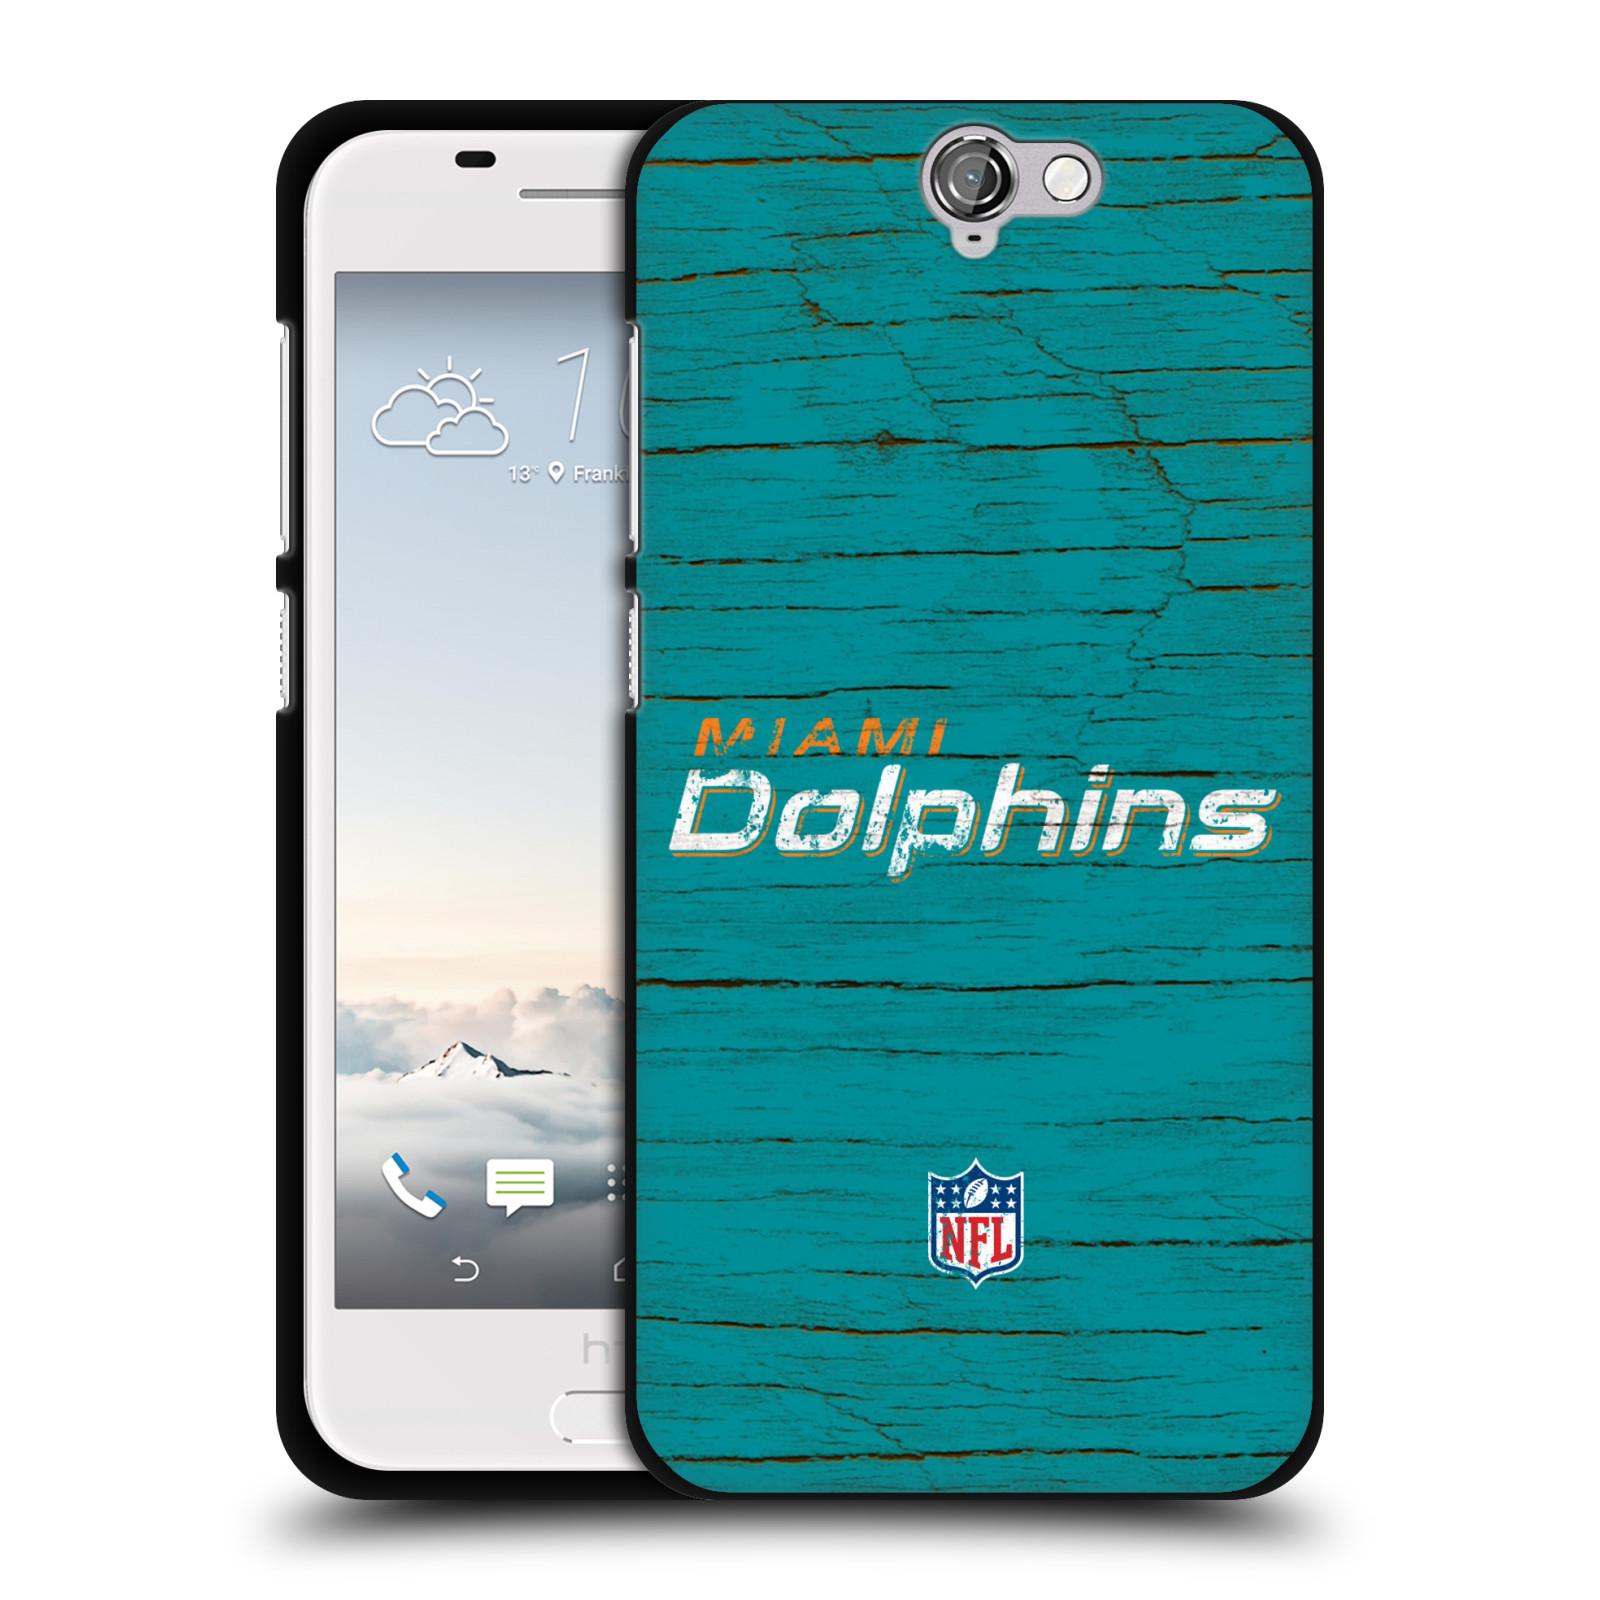 OFFICIAL-NFL-MIAMI-DOLPHINS-LOGO-BLACK-SOFT-GEL-CASE-FOR-HTC-PHONES